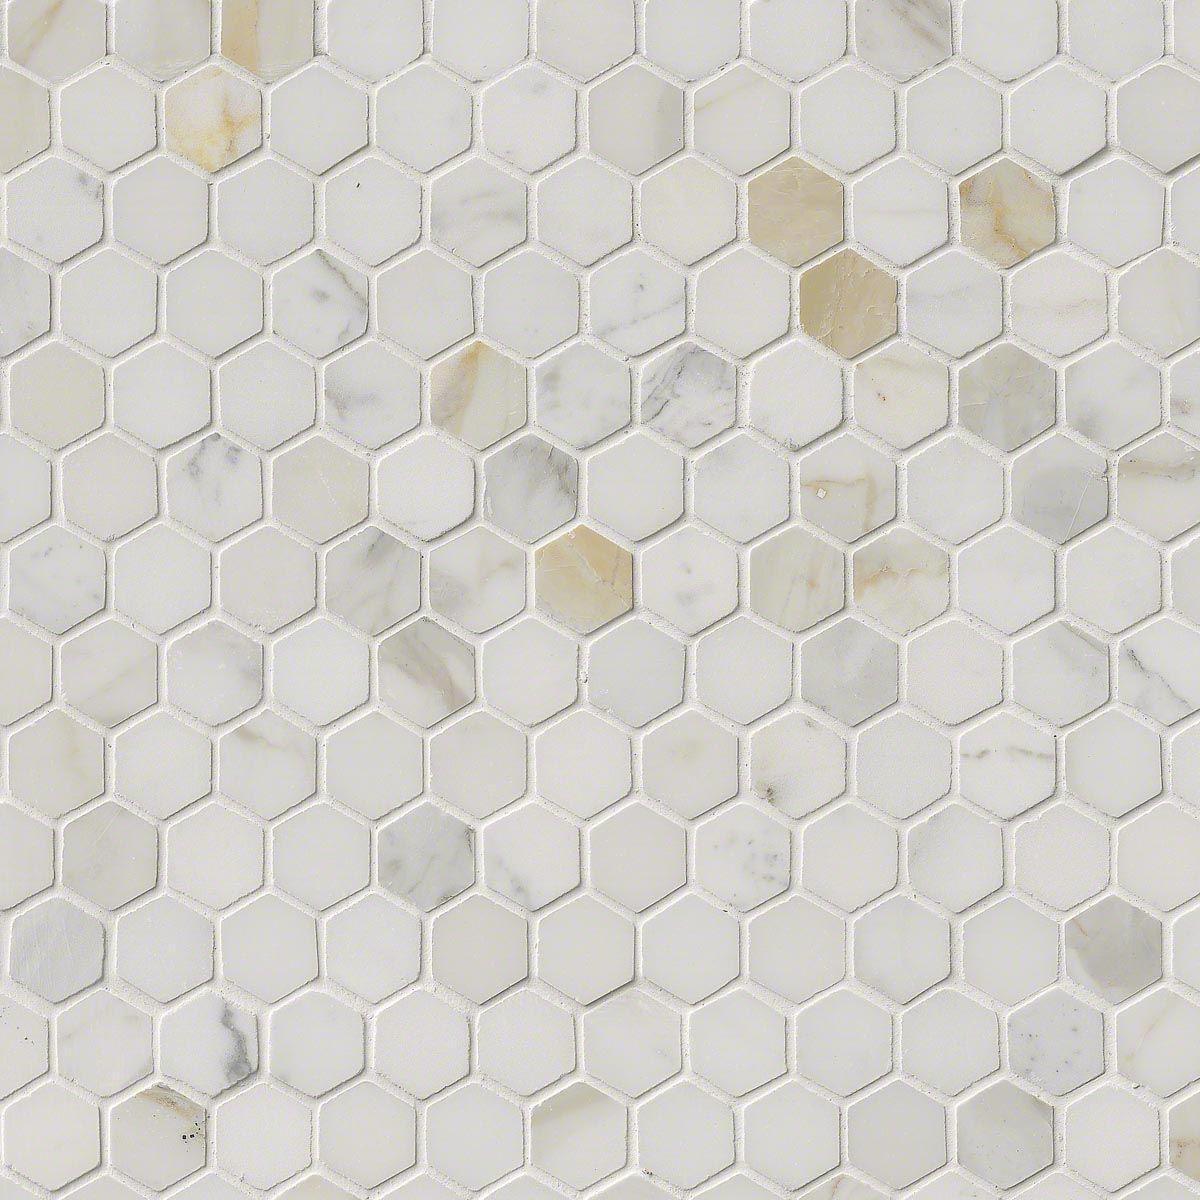 Calacatta Gold Marble 1 Hexagon Polished Mosaics Calacatta Gold Hexagonal Mosaic Calacatta Gold Marble